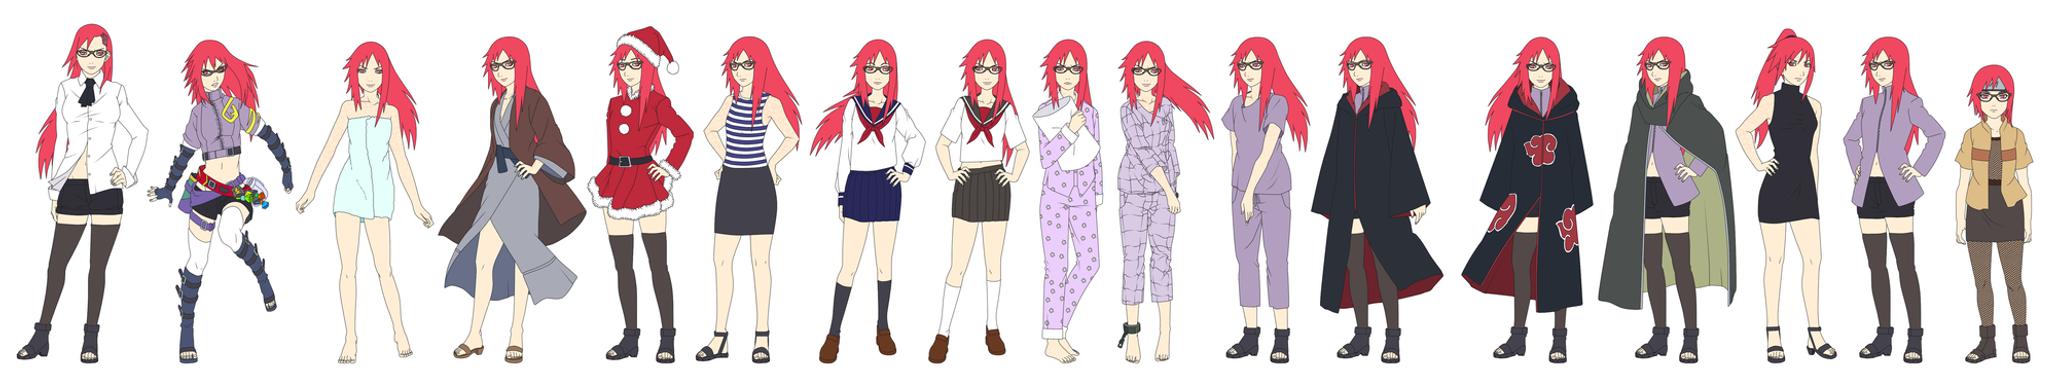 Karin (NARUTO), Fanart | page 3 - Zerochan Anime Image Board